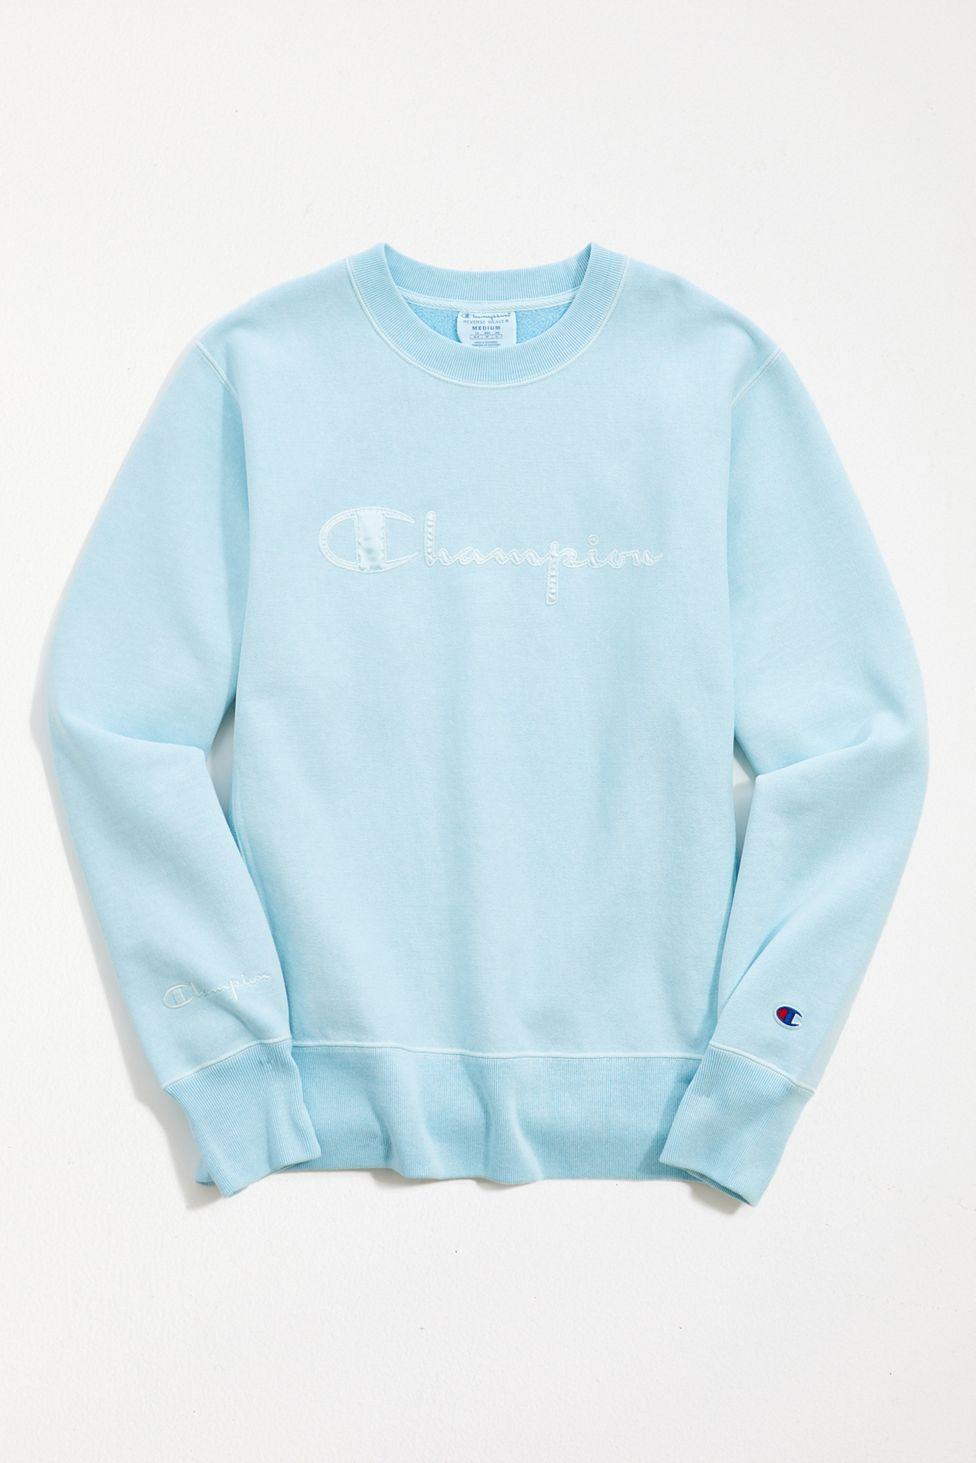 Champion Uo Exclusive Boyfriend Crew Neck Sweatshirt Urban Outfitters Sweatshirts Champion Clothing Crew Neck Sweatshirt [ 1463 x 976 Pixel ]